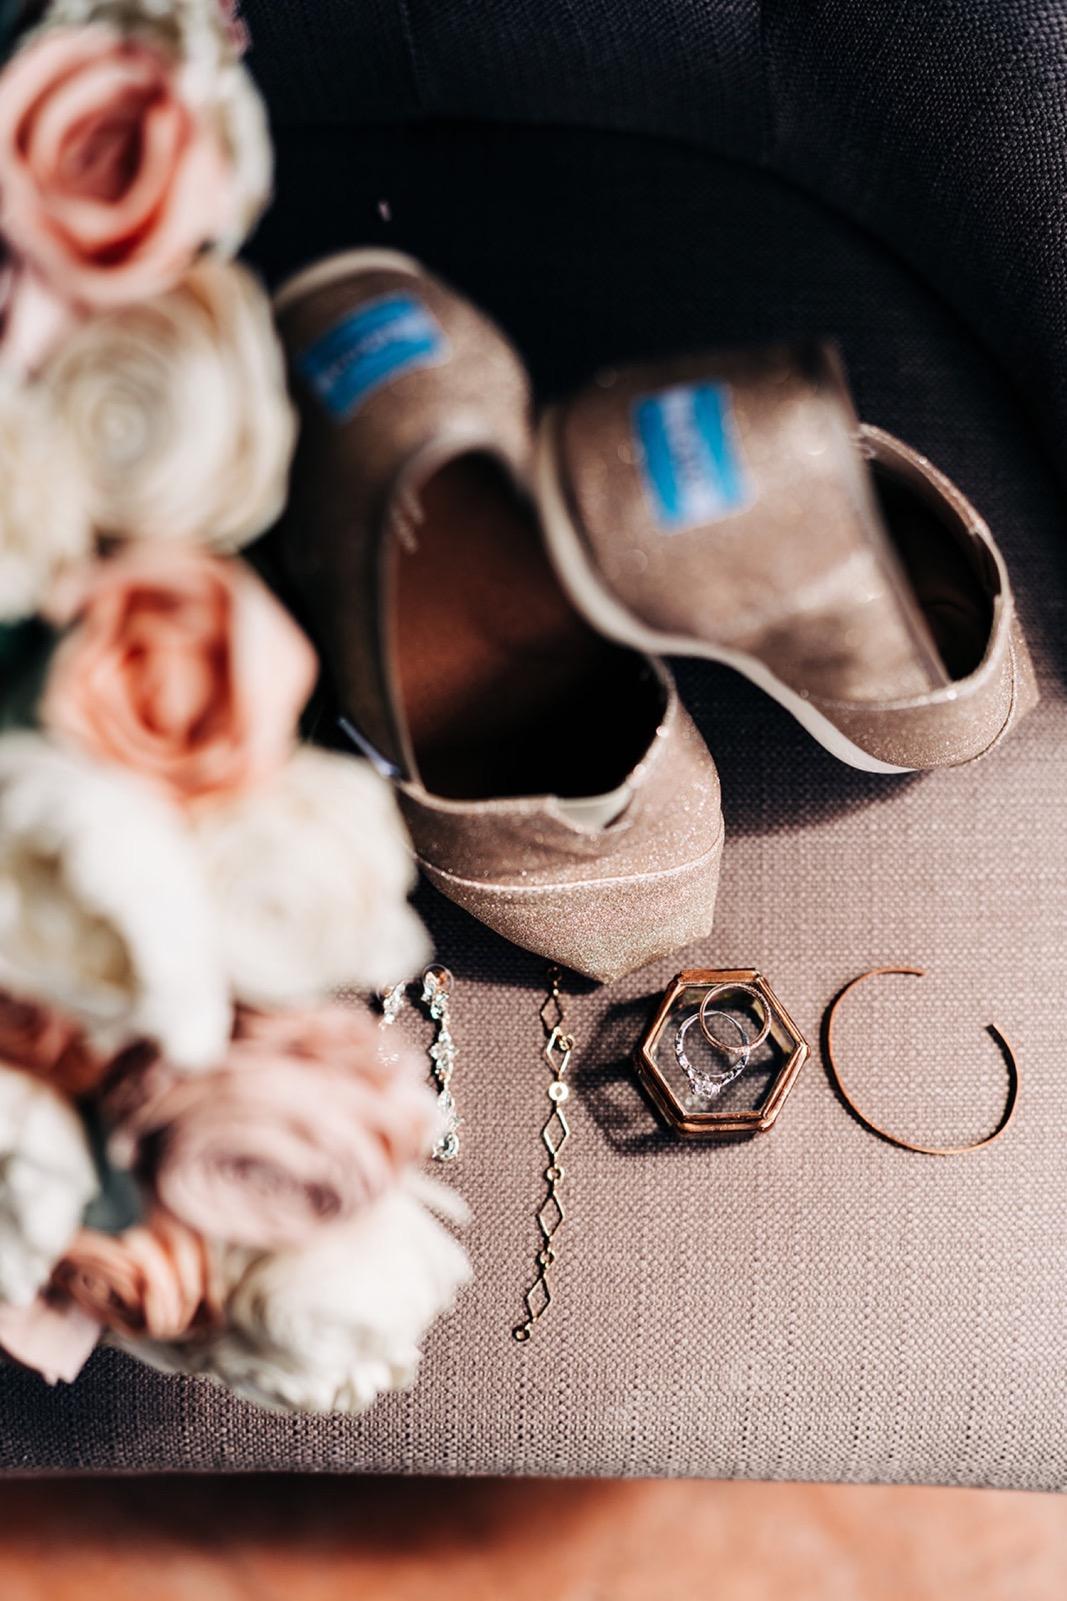 007_falissa_heather_wedding-20.jpg